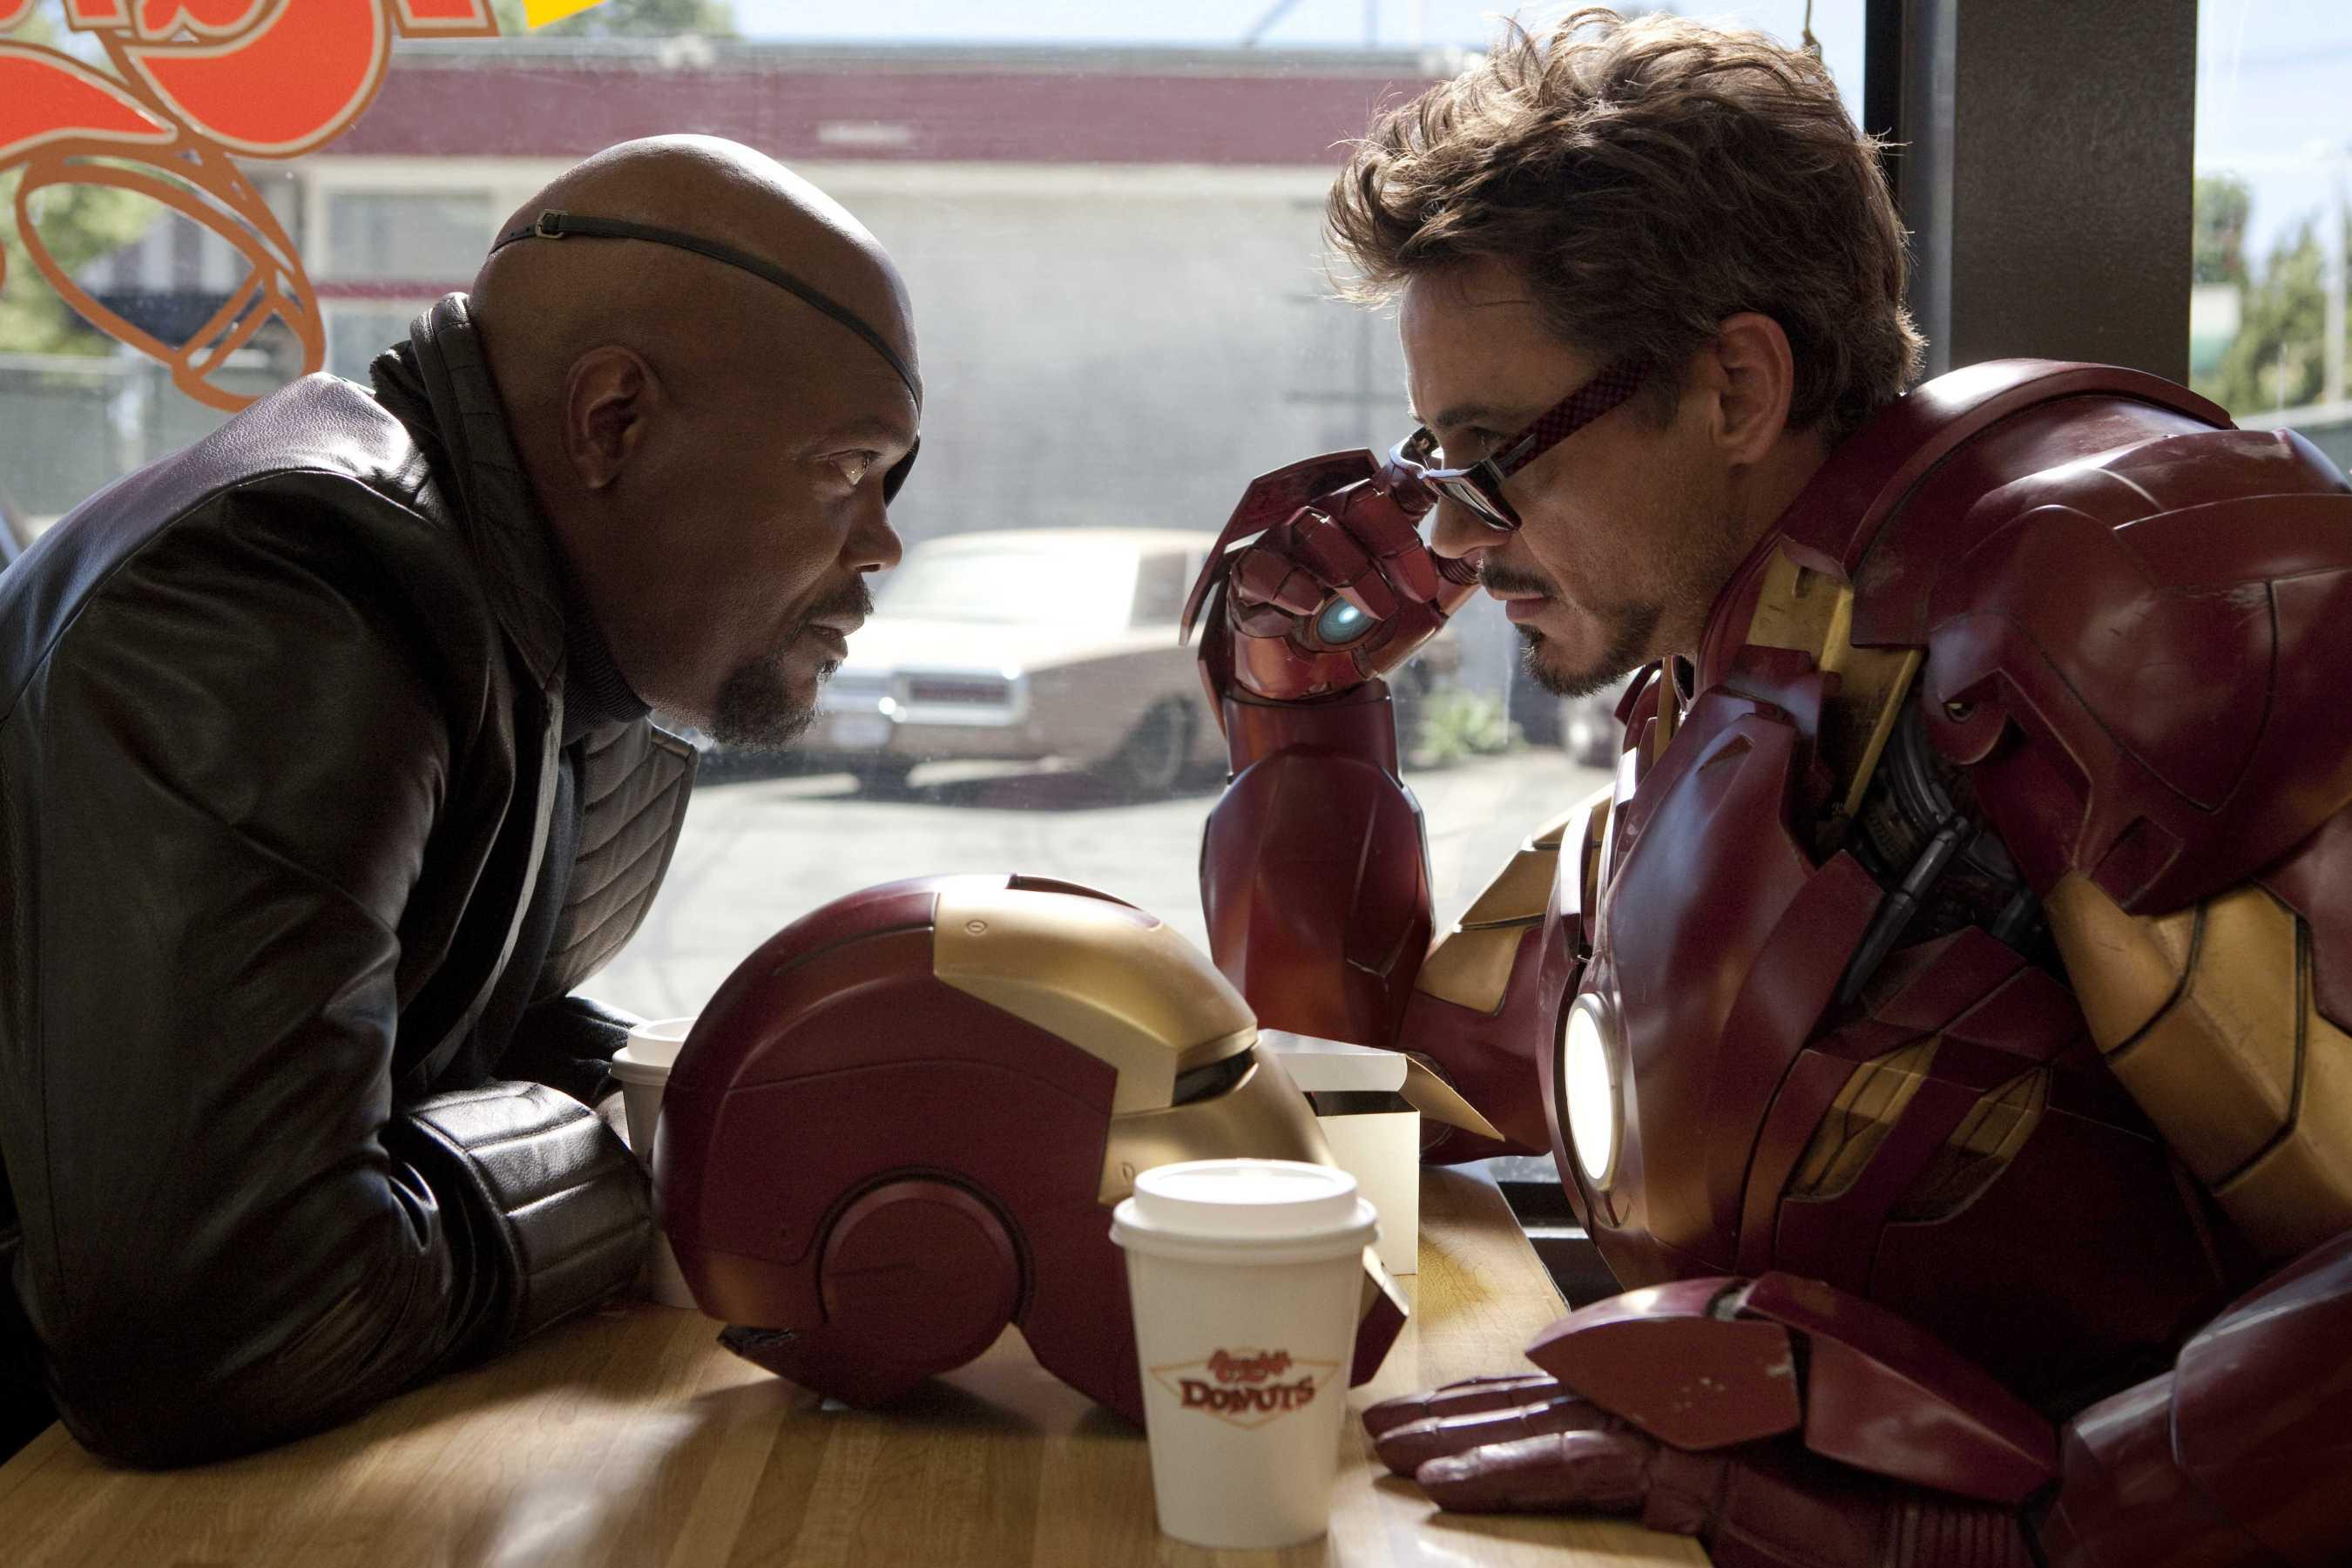 Nick Fury (Samuel L. Jackson) and Tony Stark/Iron Man (Robert Downey Jr) in Iron Man 2 (2010)